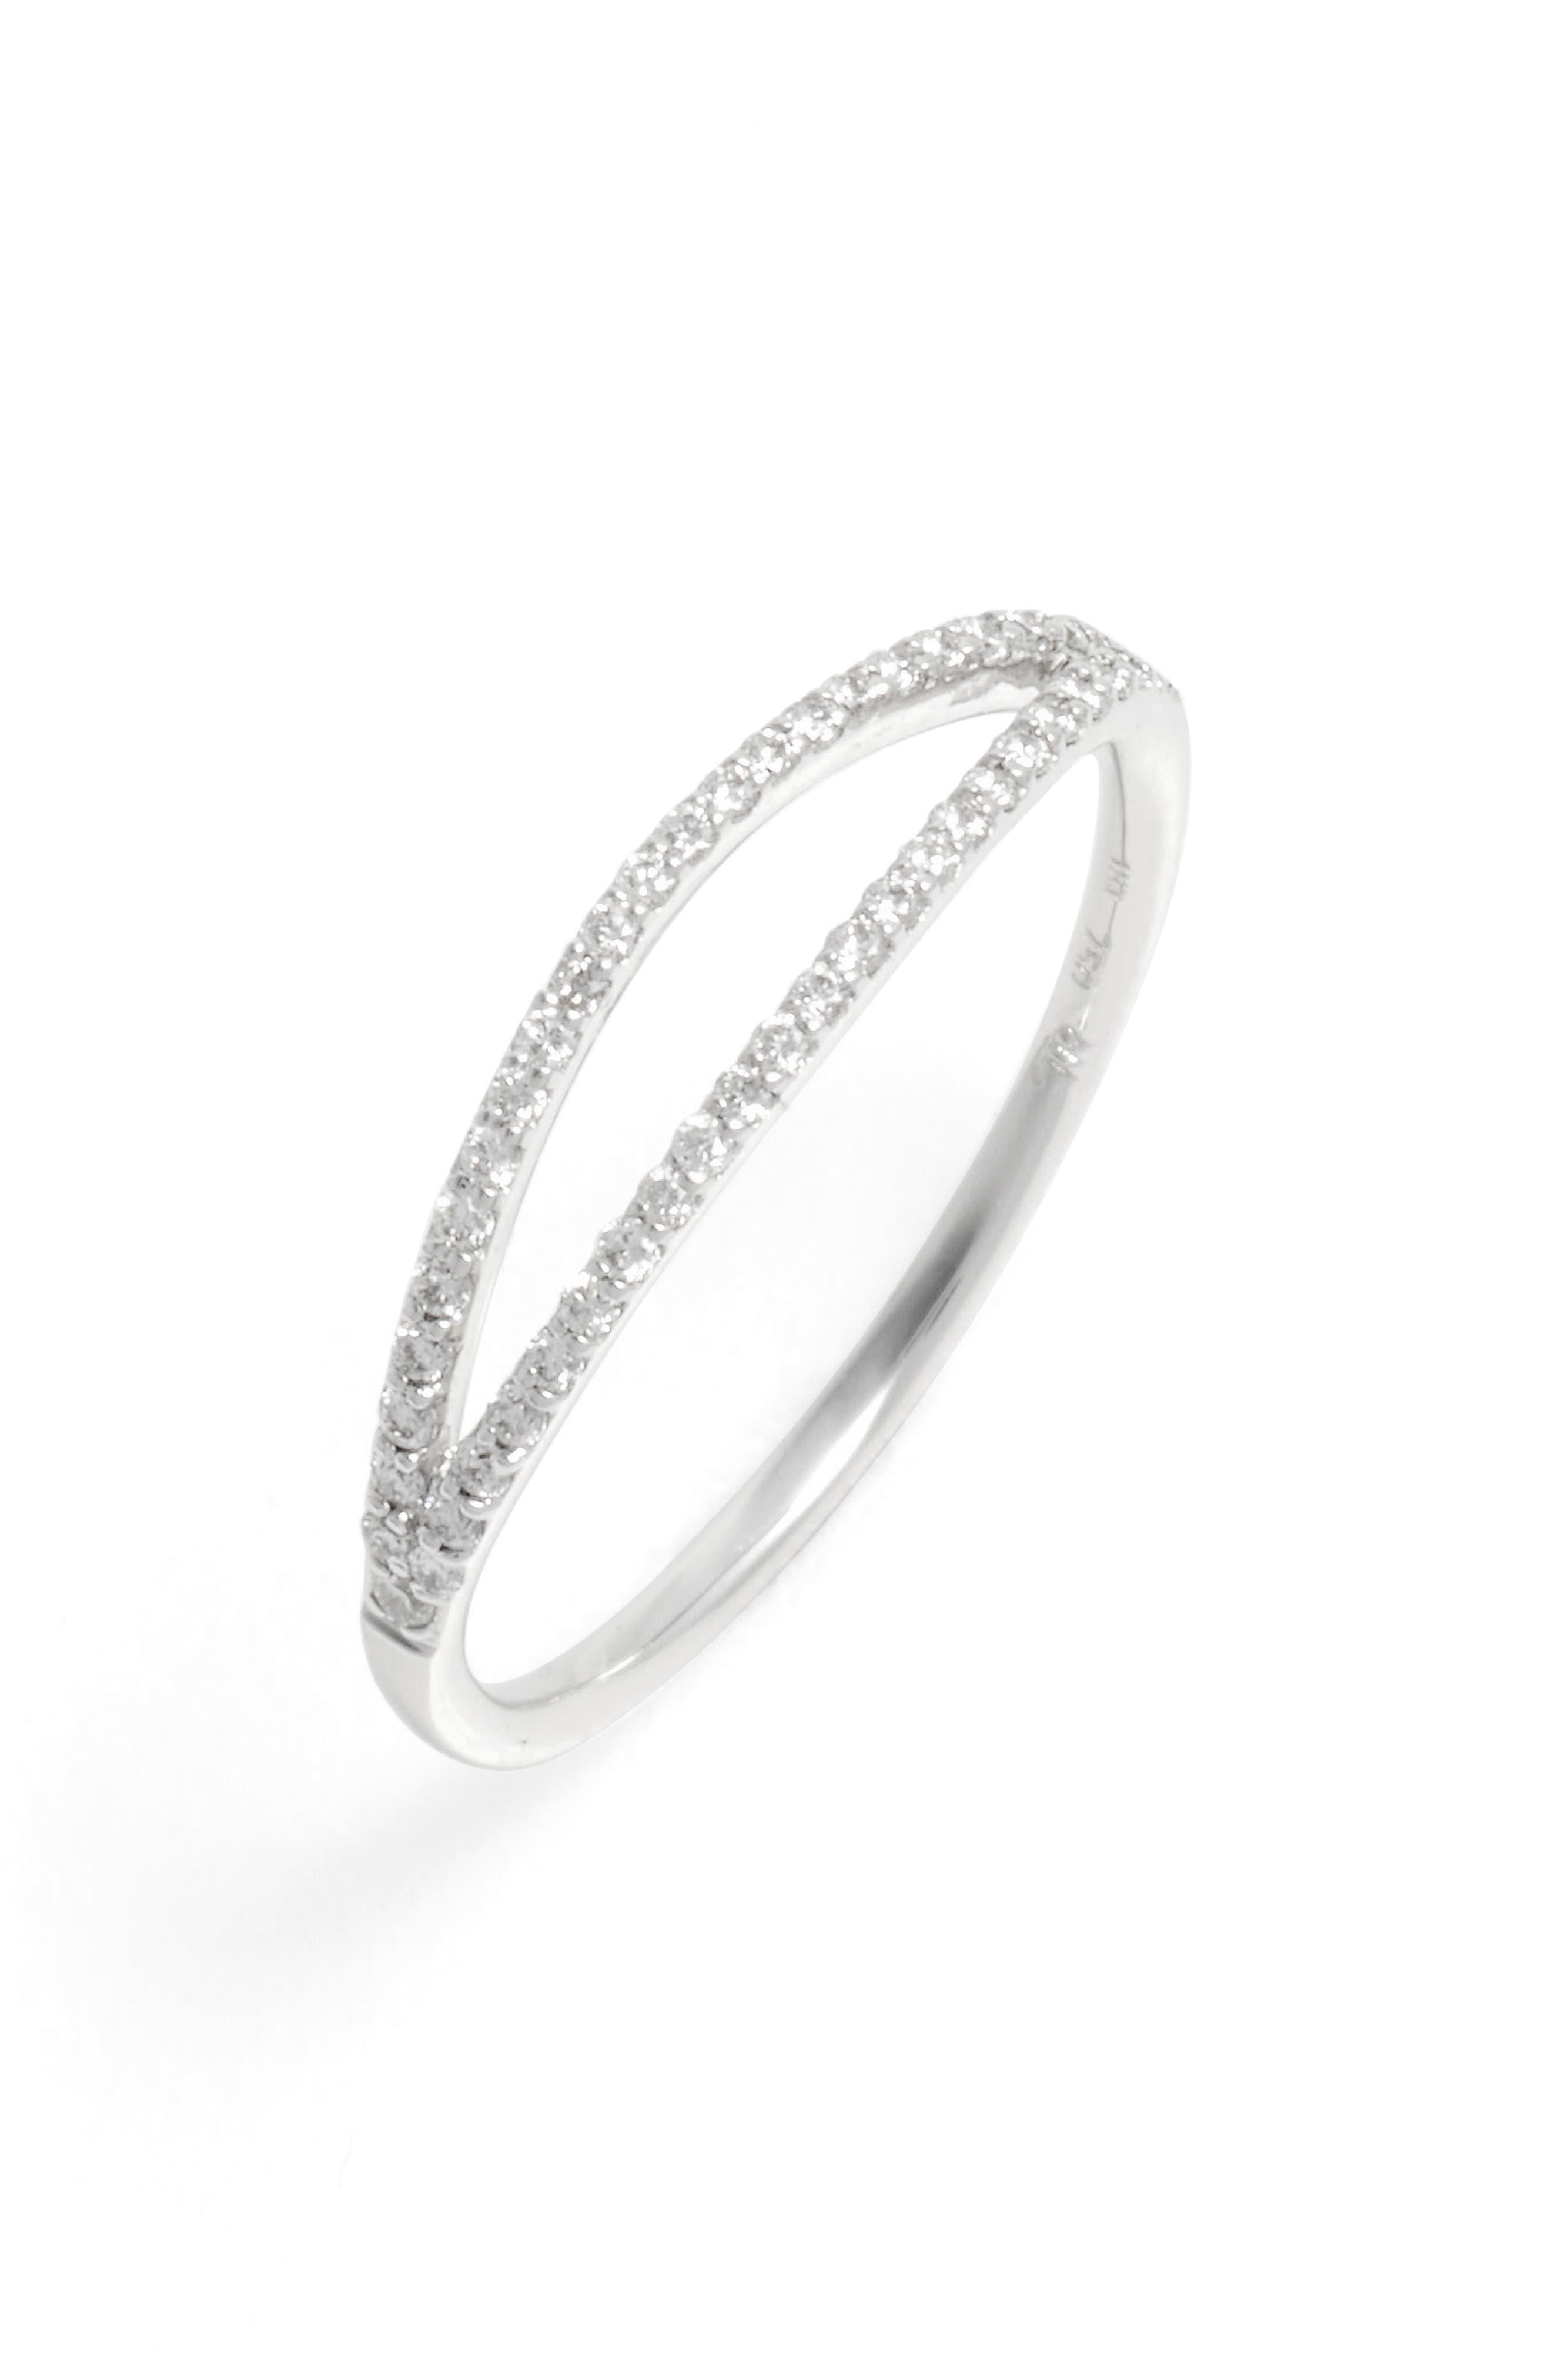 Main Image - Bony Levy Kiera Two-Row Diamond Stack Ring (Nordstrom Exclusive)